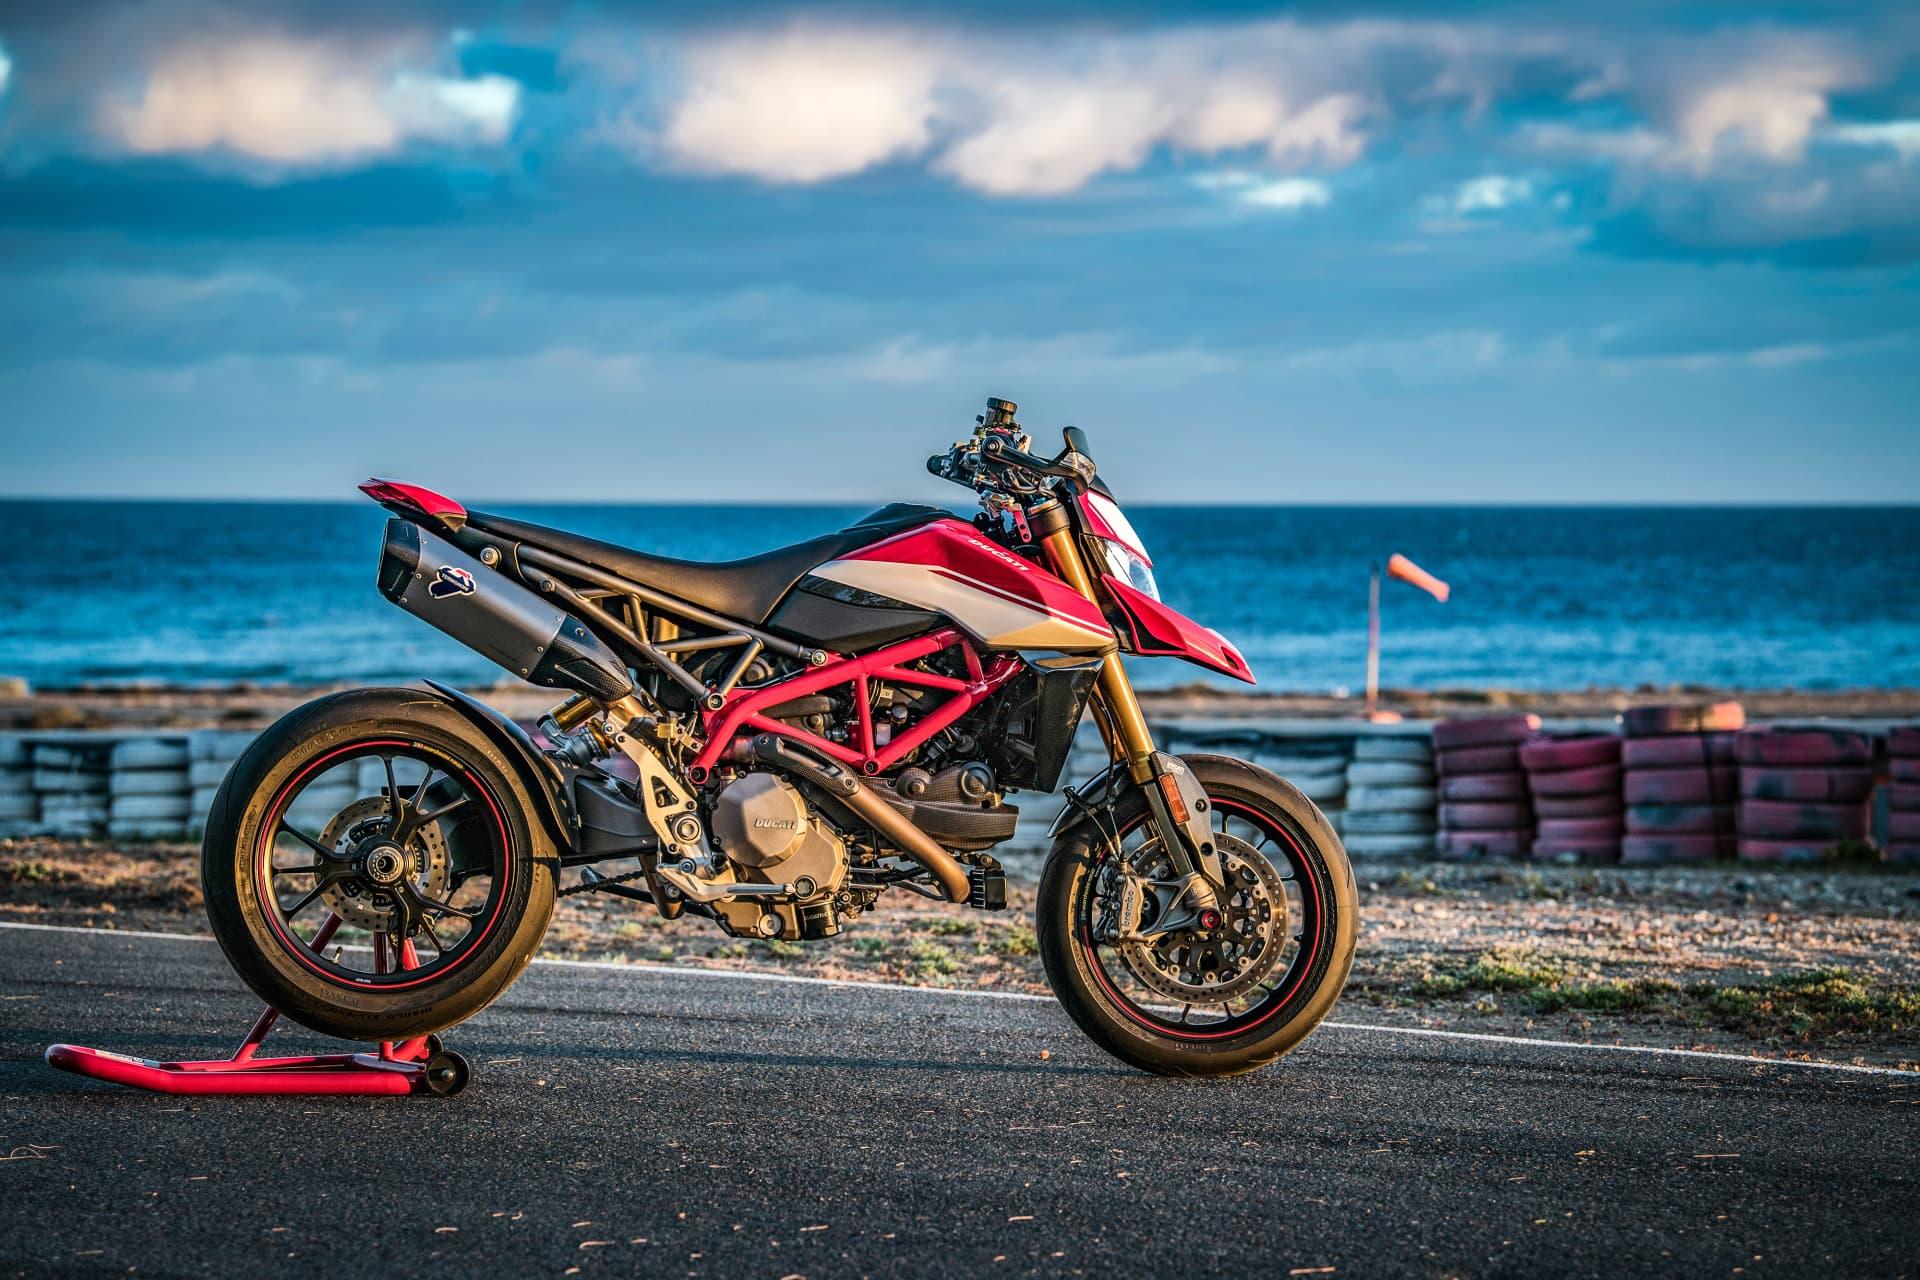 Ducati Hypermotard 950 Sp Static 04 Uc70306 Mid